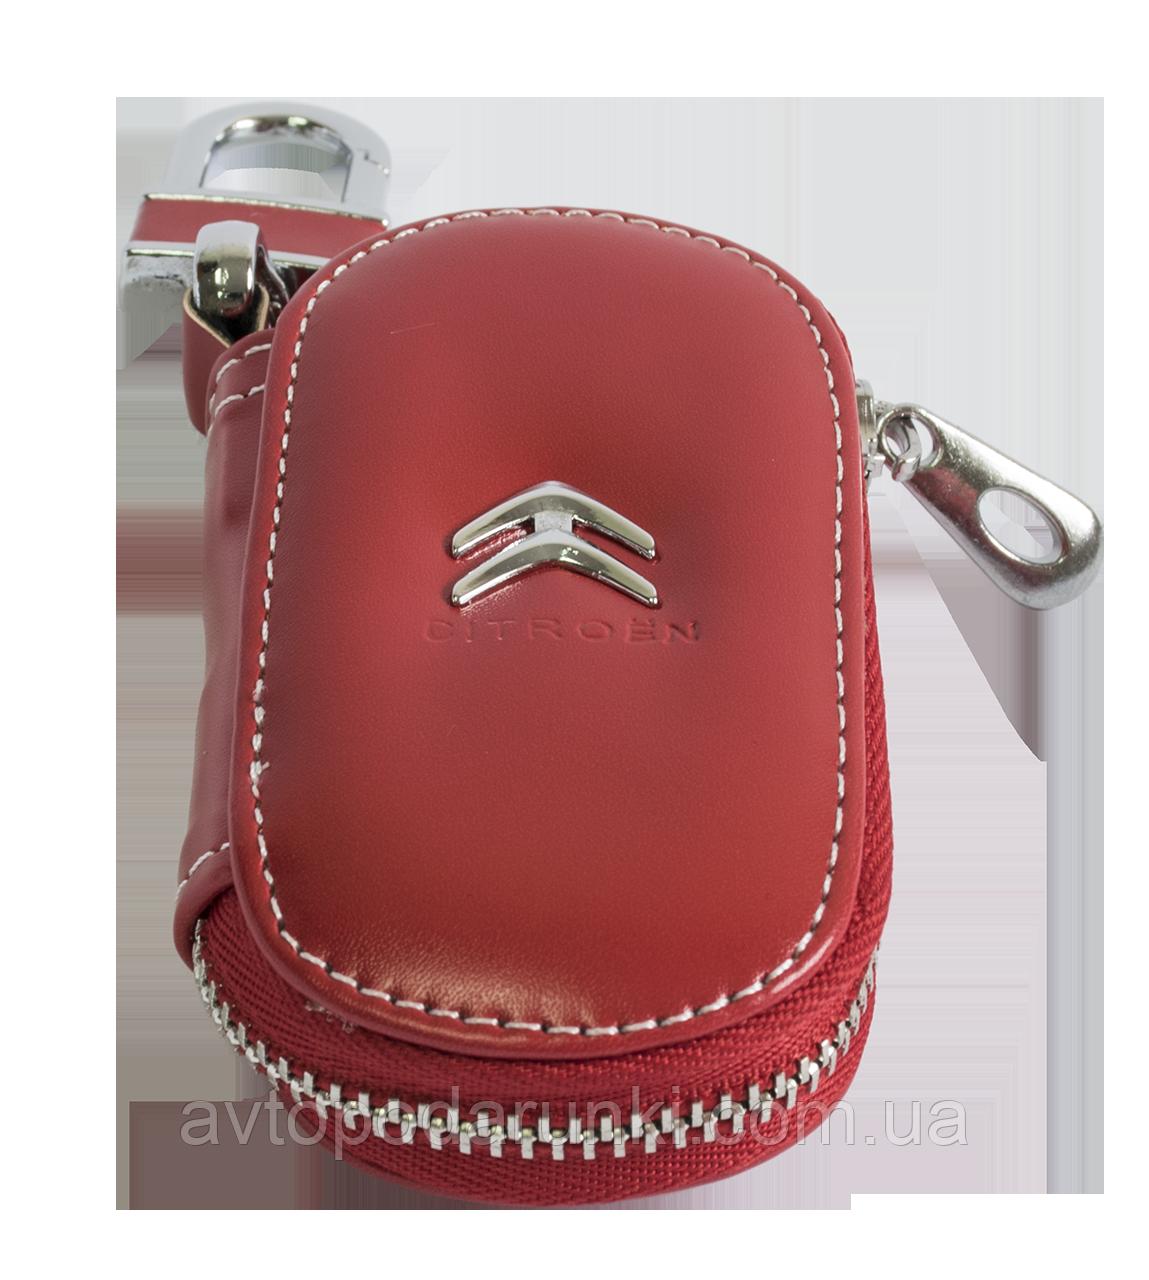 Ключница CITROEN, кожаная автоключница с логотипом  СИТРОЕН (красная 17015)